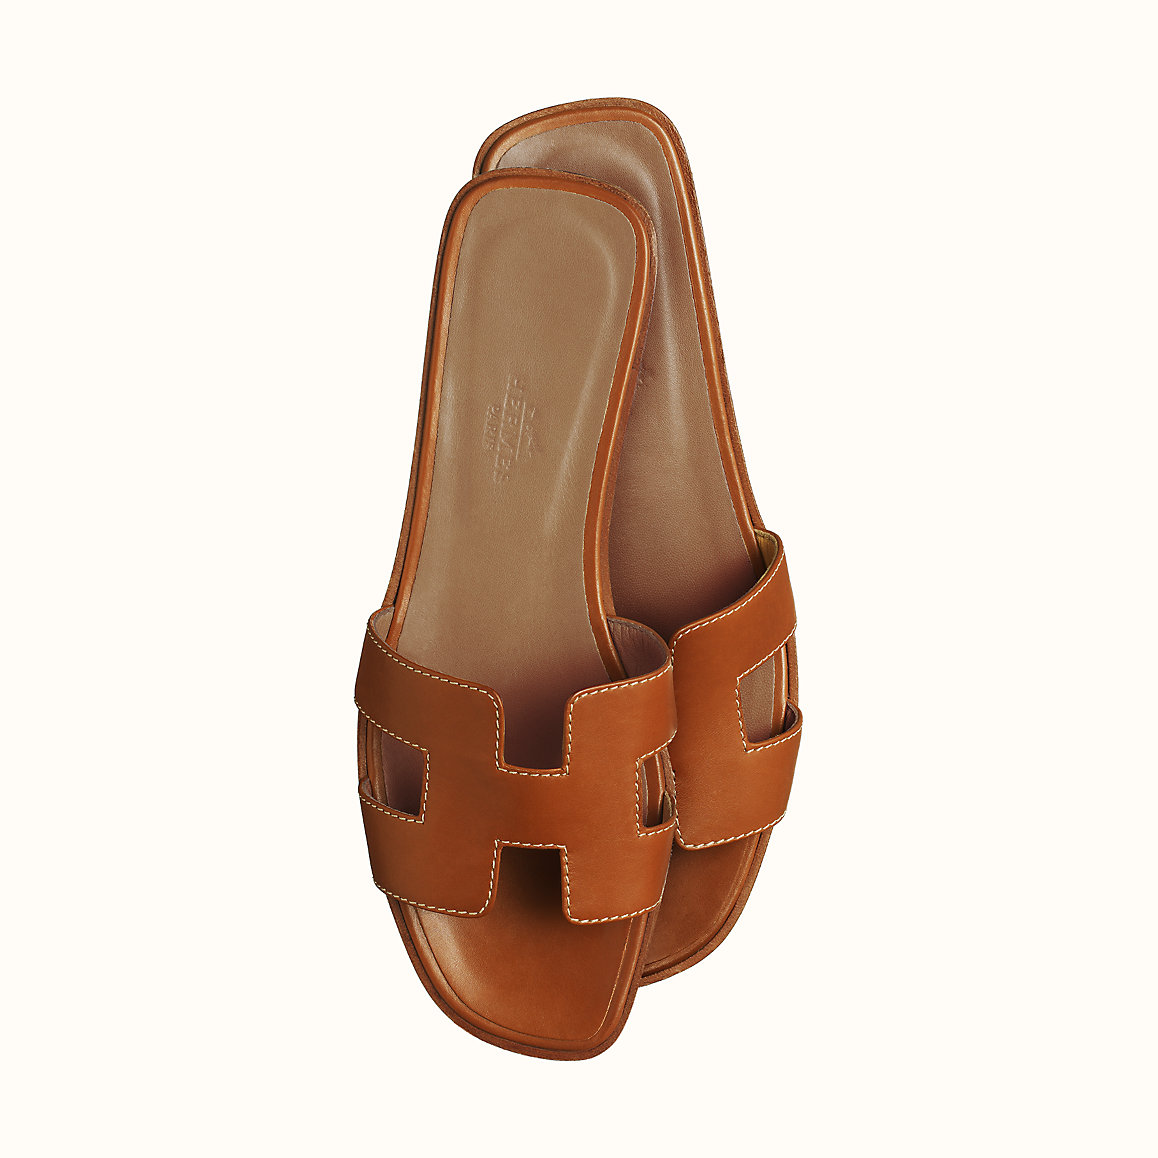 oran-sandal--021056Z 03-above-2-300-0-1158-1158_b.jpg